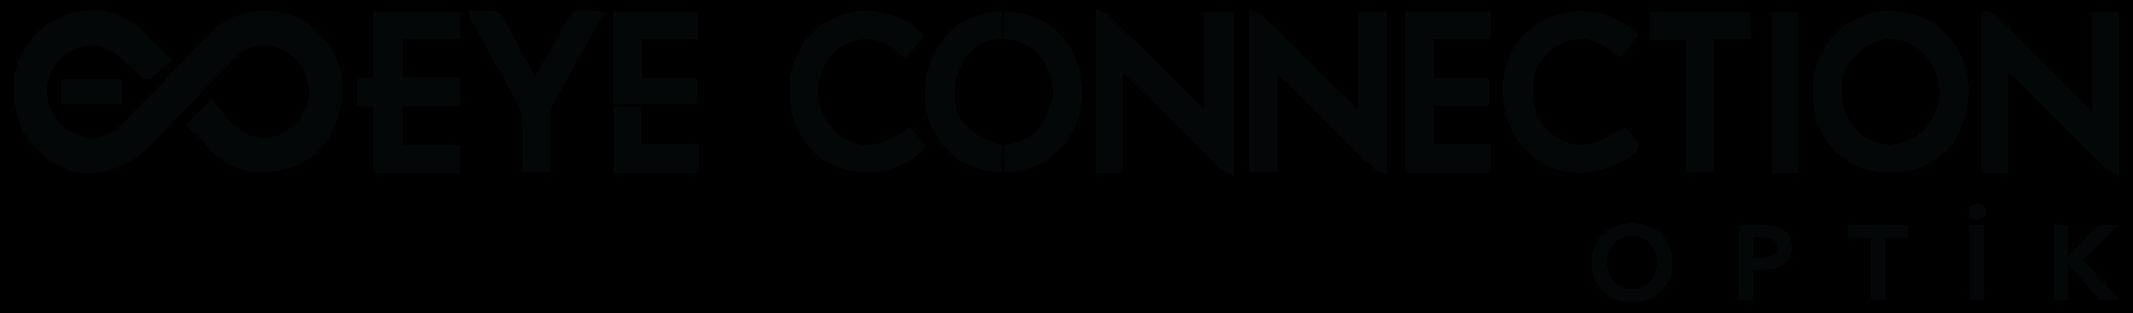 logo.png (7 KB)